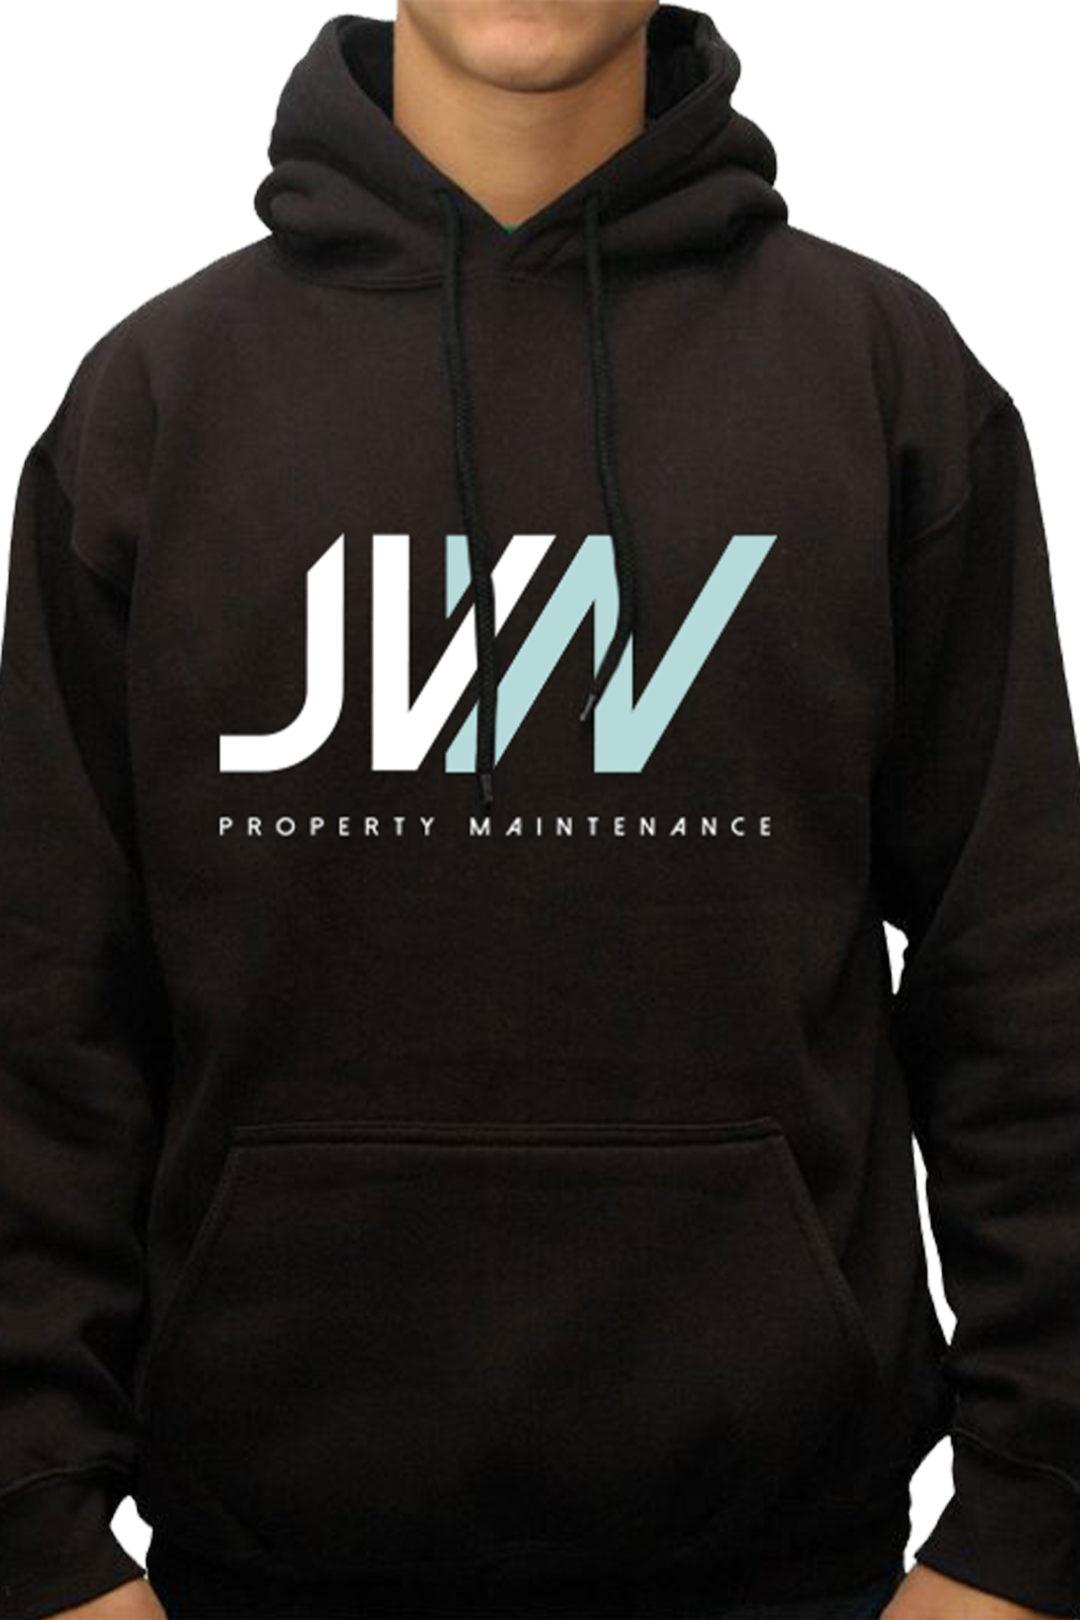 JVW PROPERTY MAINTENANCE